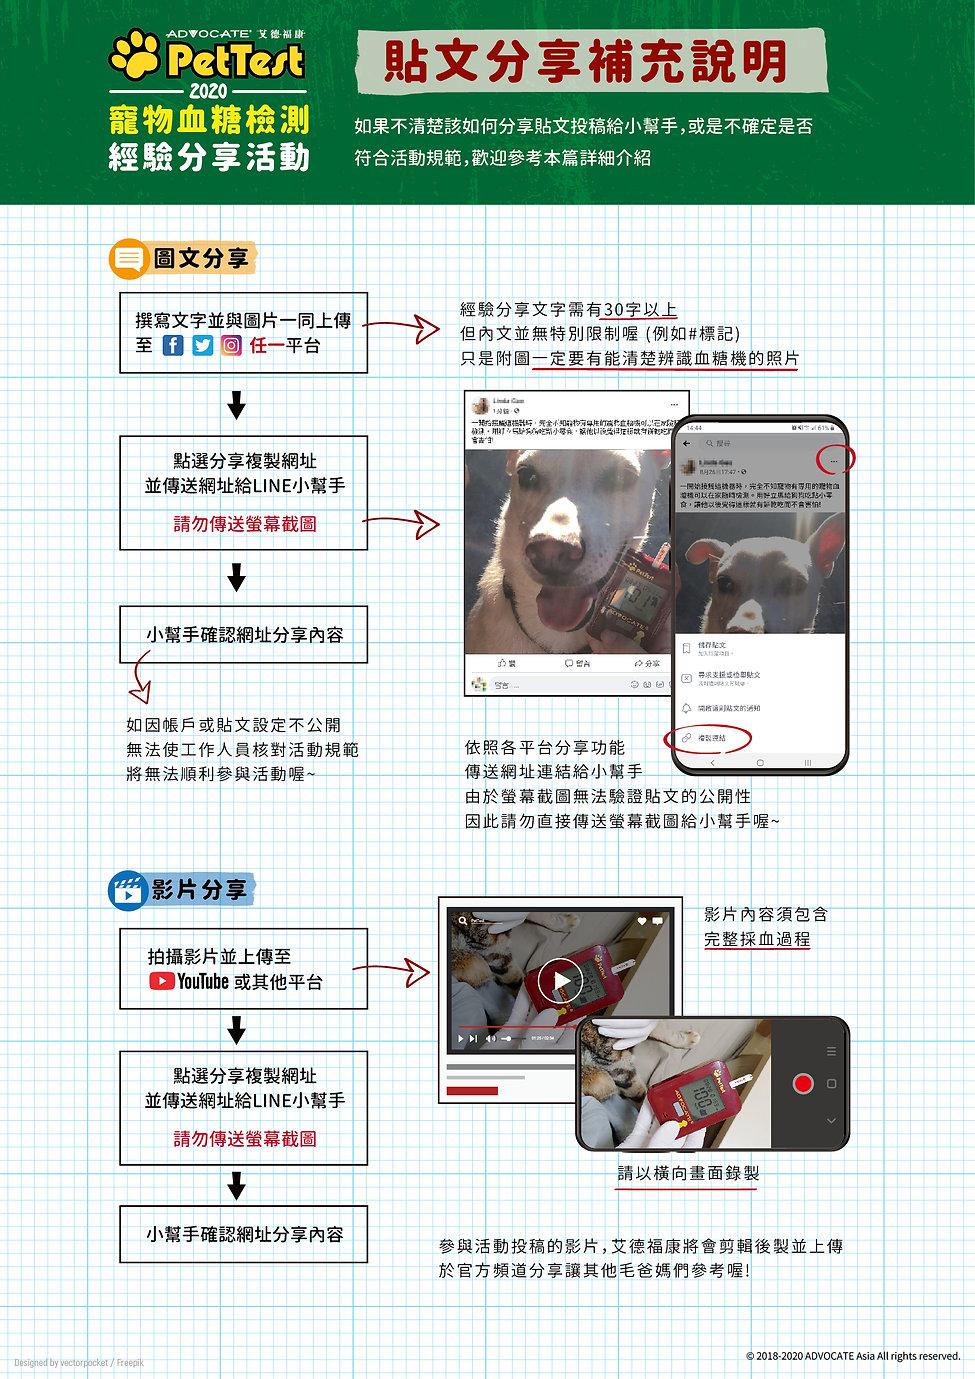 2020PetTest測量經驗分享活動_分享方式解說-01.jpg